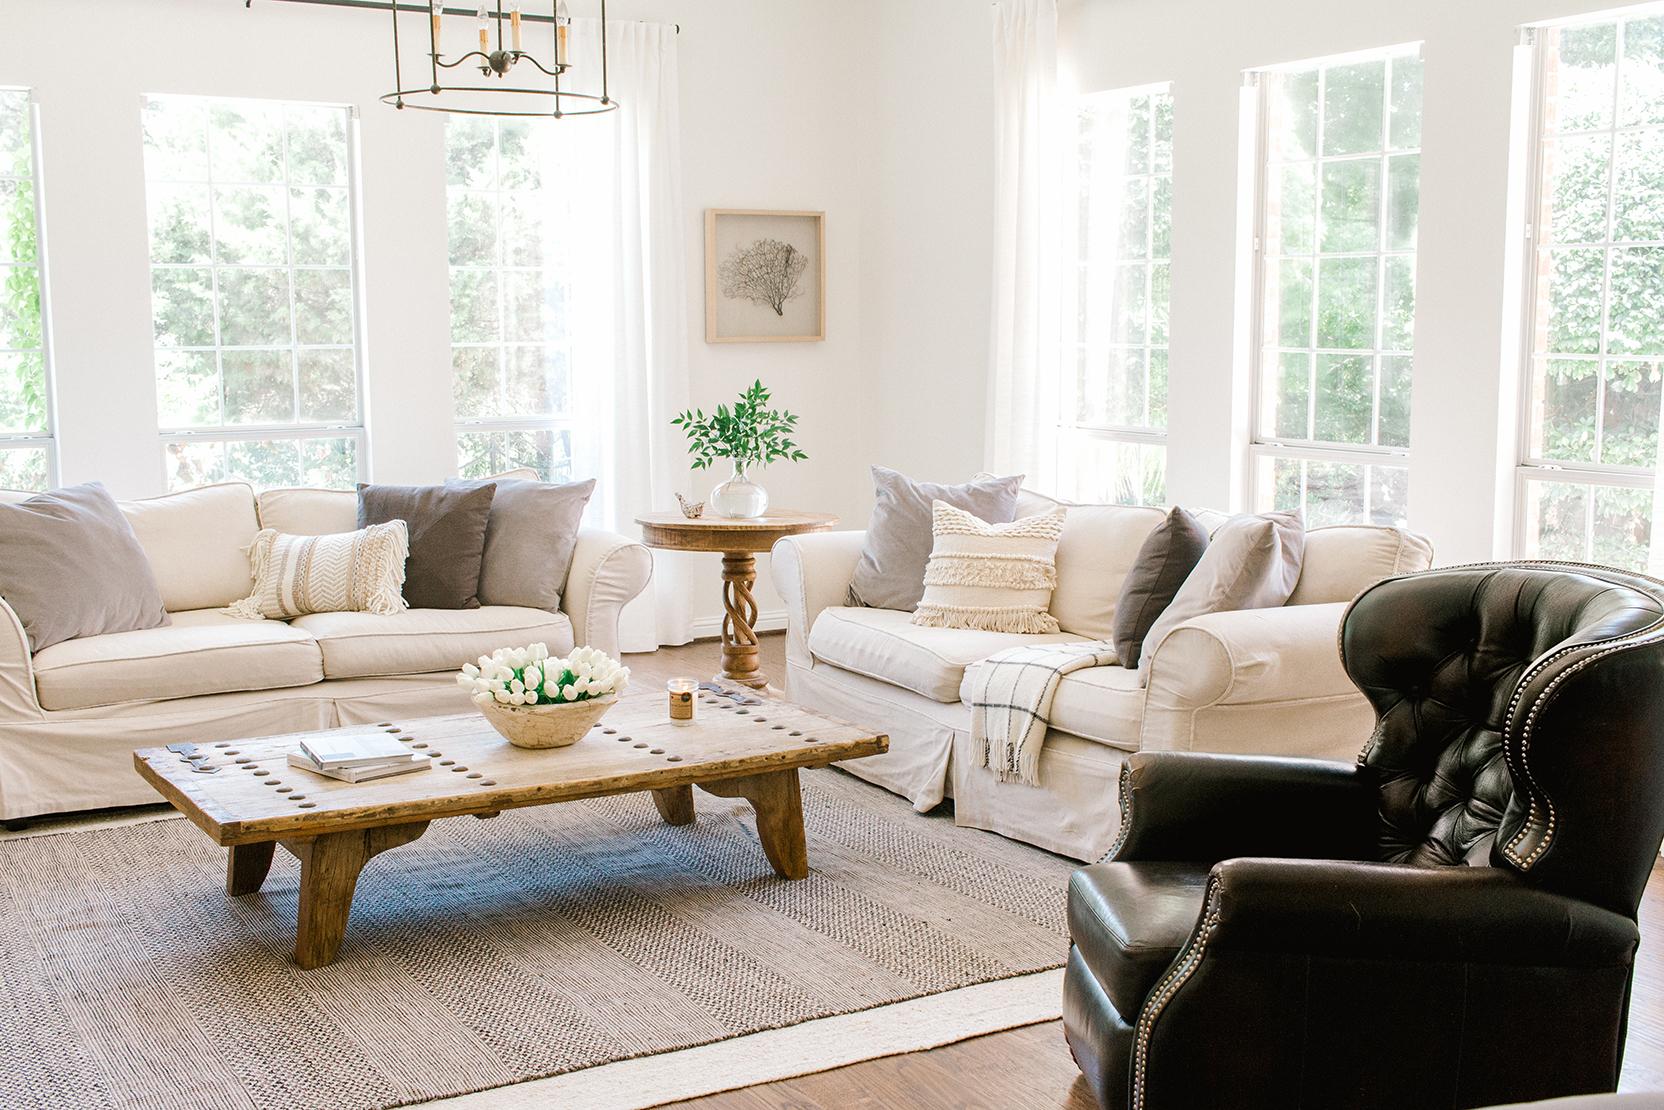 farmhouse living room images modern design coastal reveal jpg